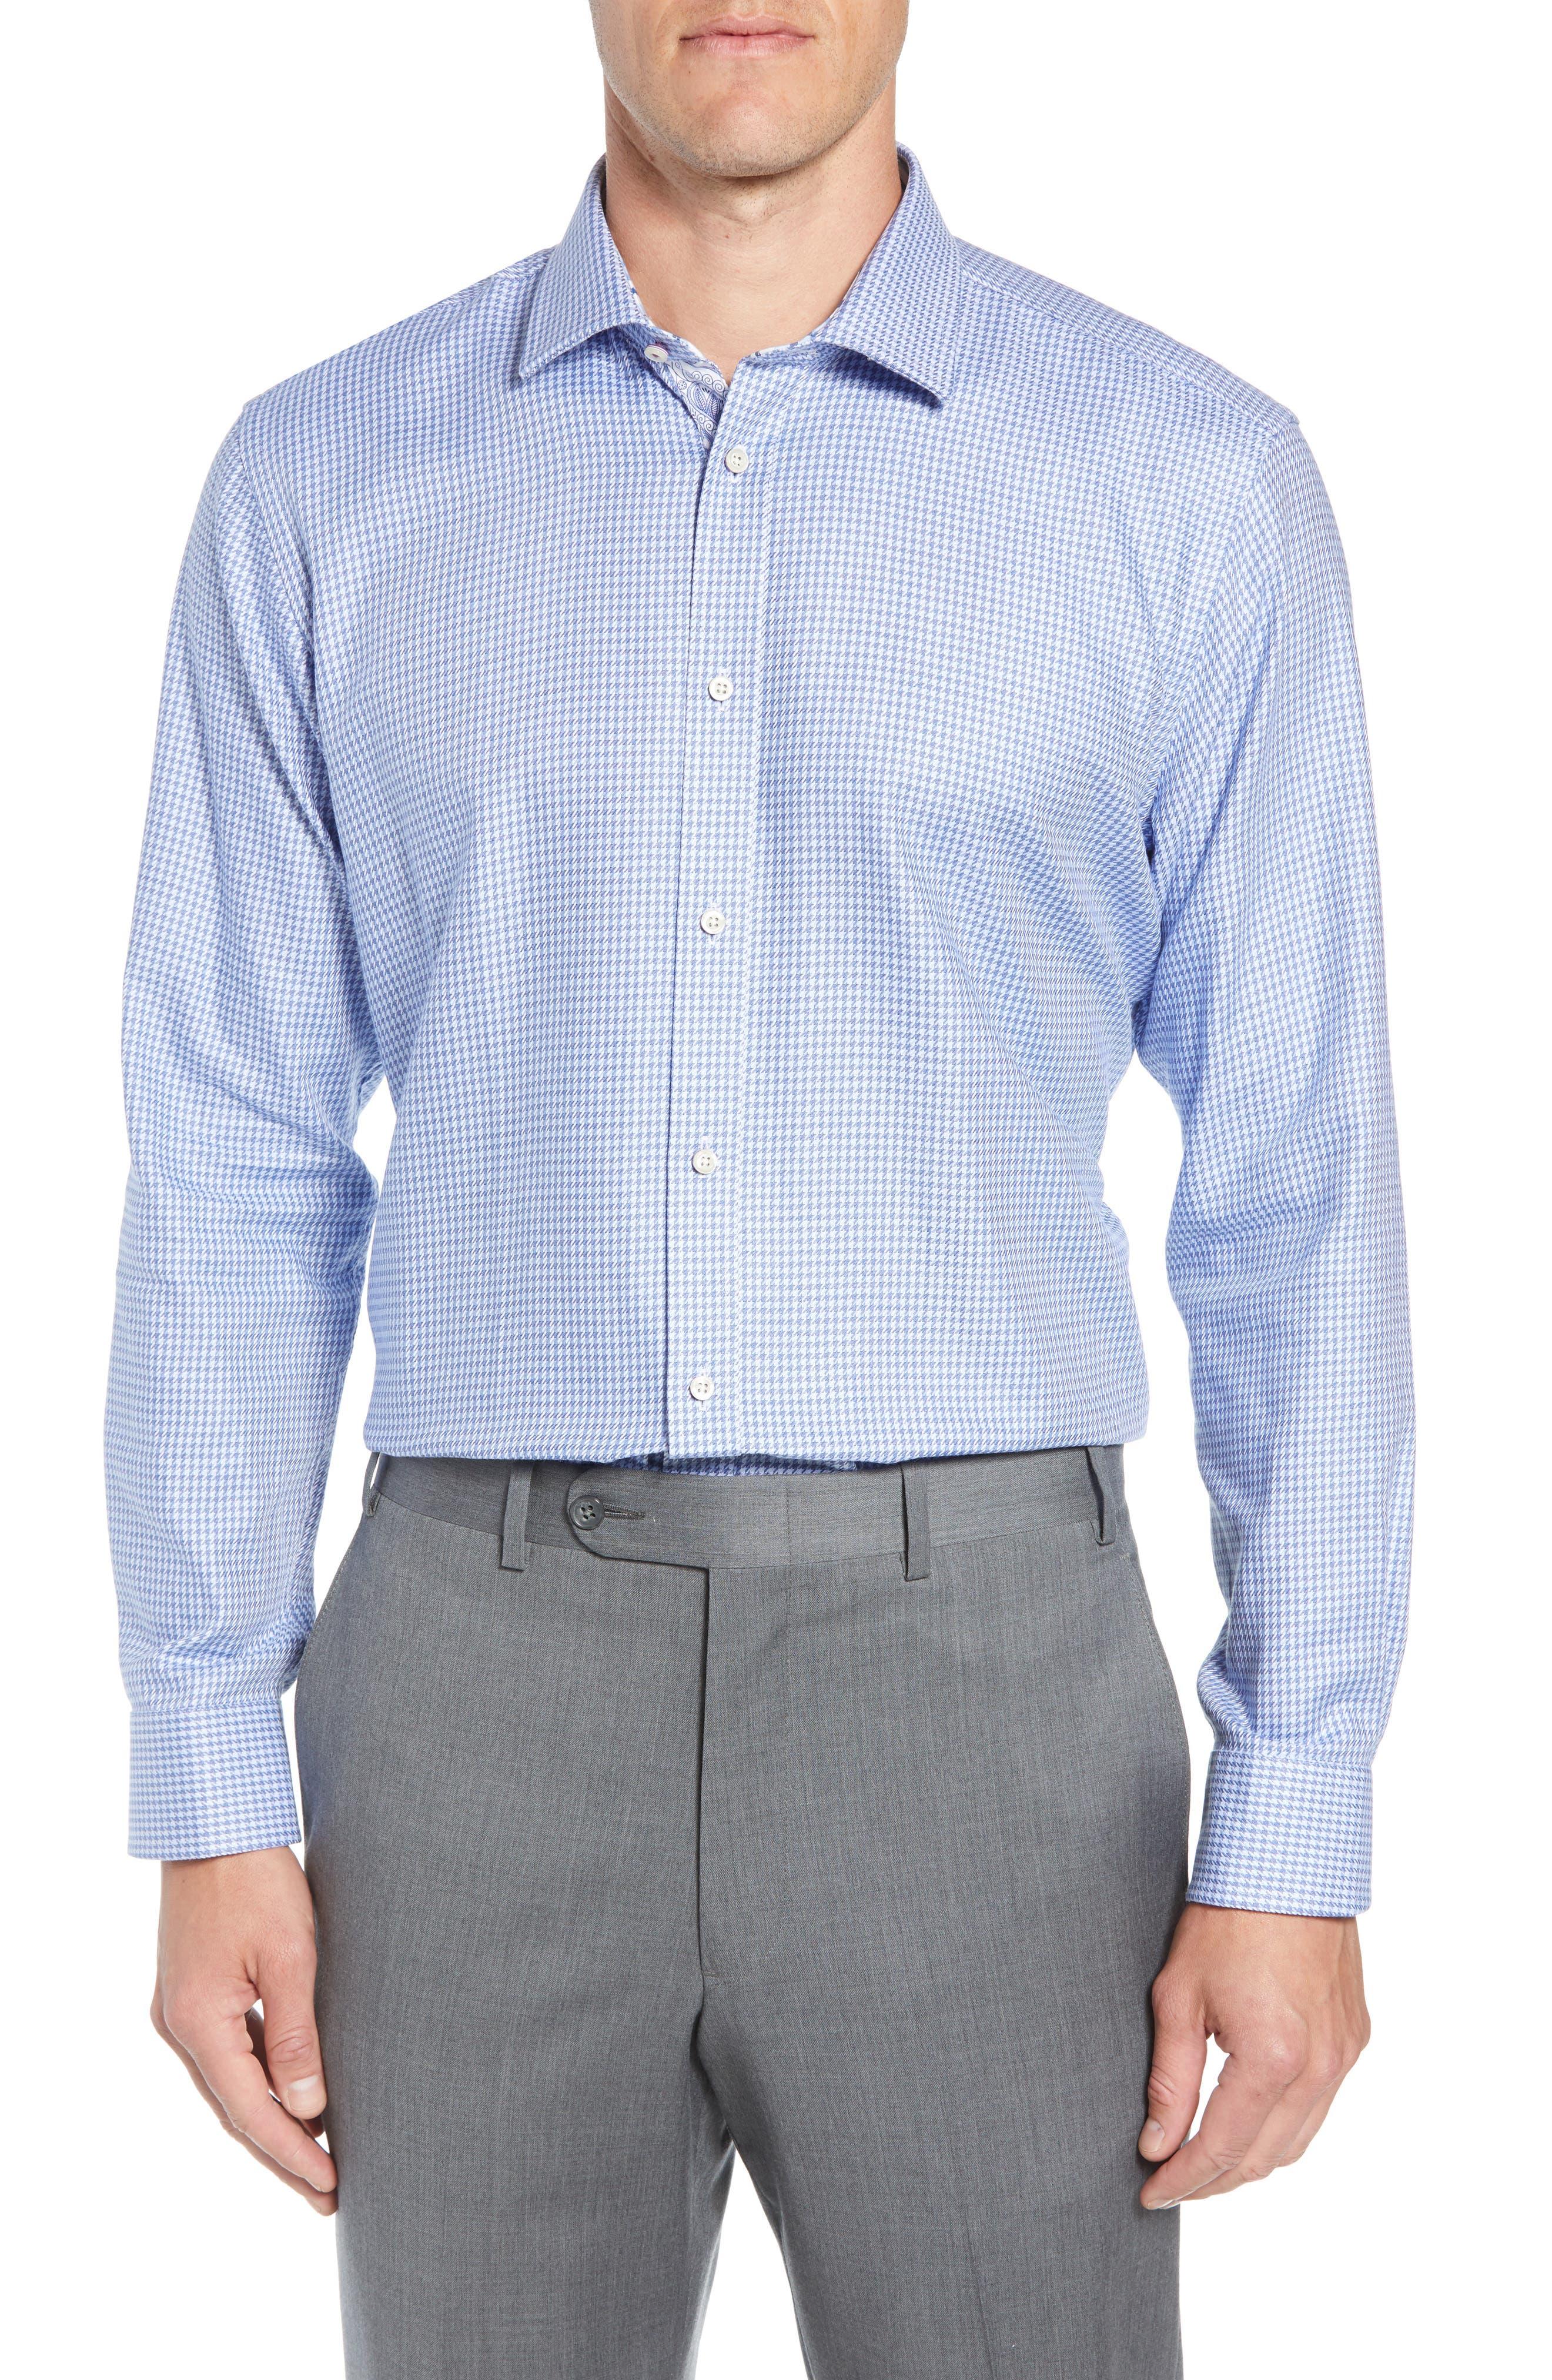 Franks Trim Fit Houndstooth Dress Shirt,                             Main thumbnail 1, color,                             BLUE